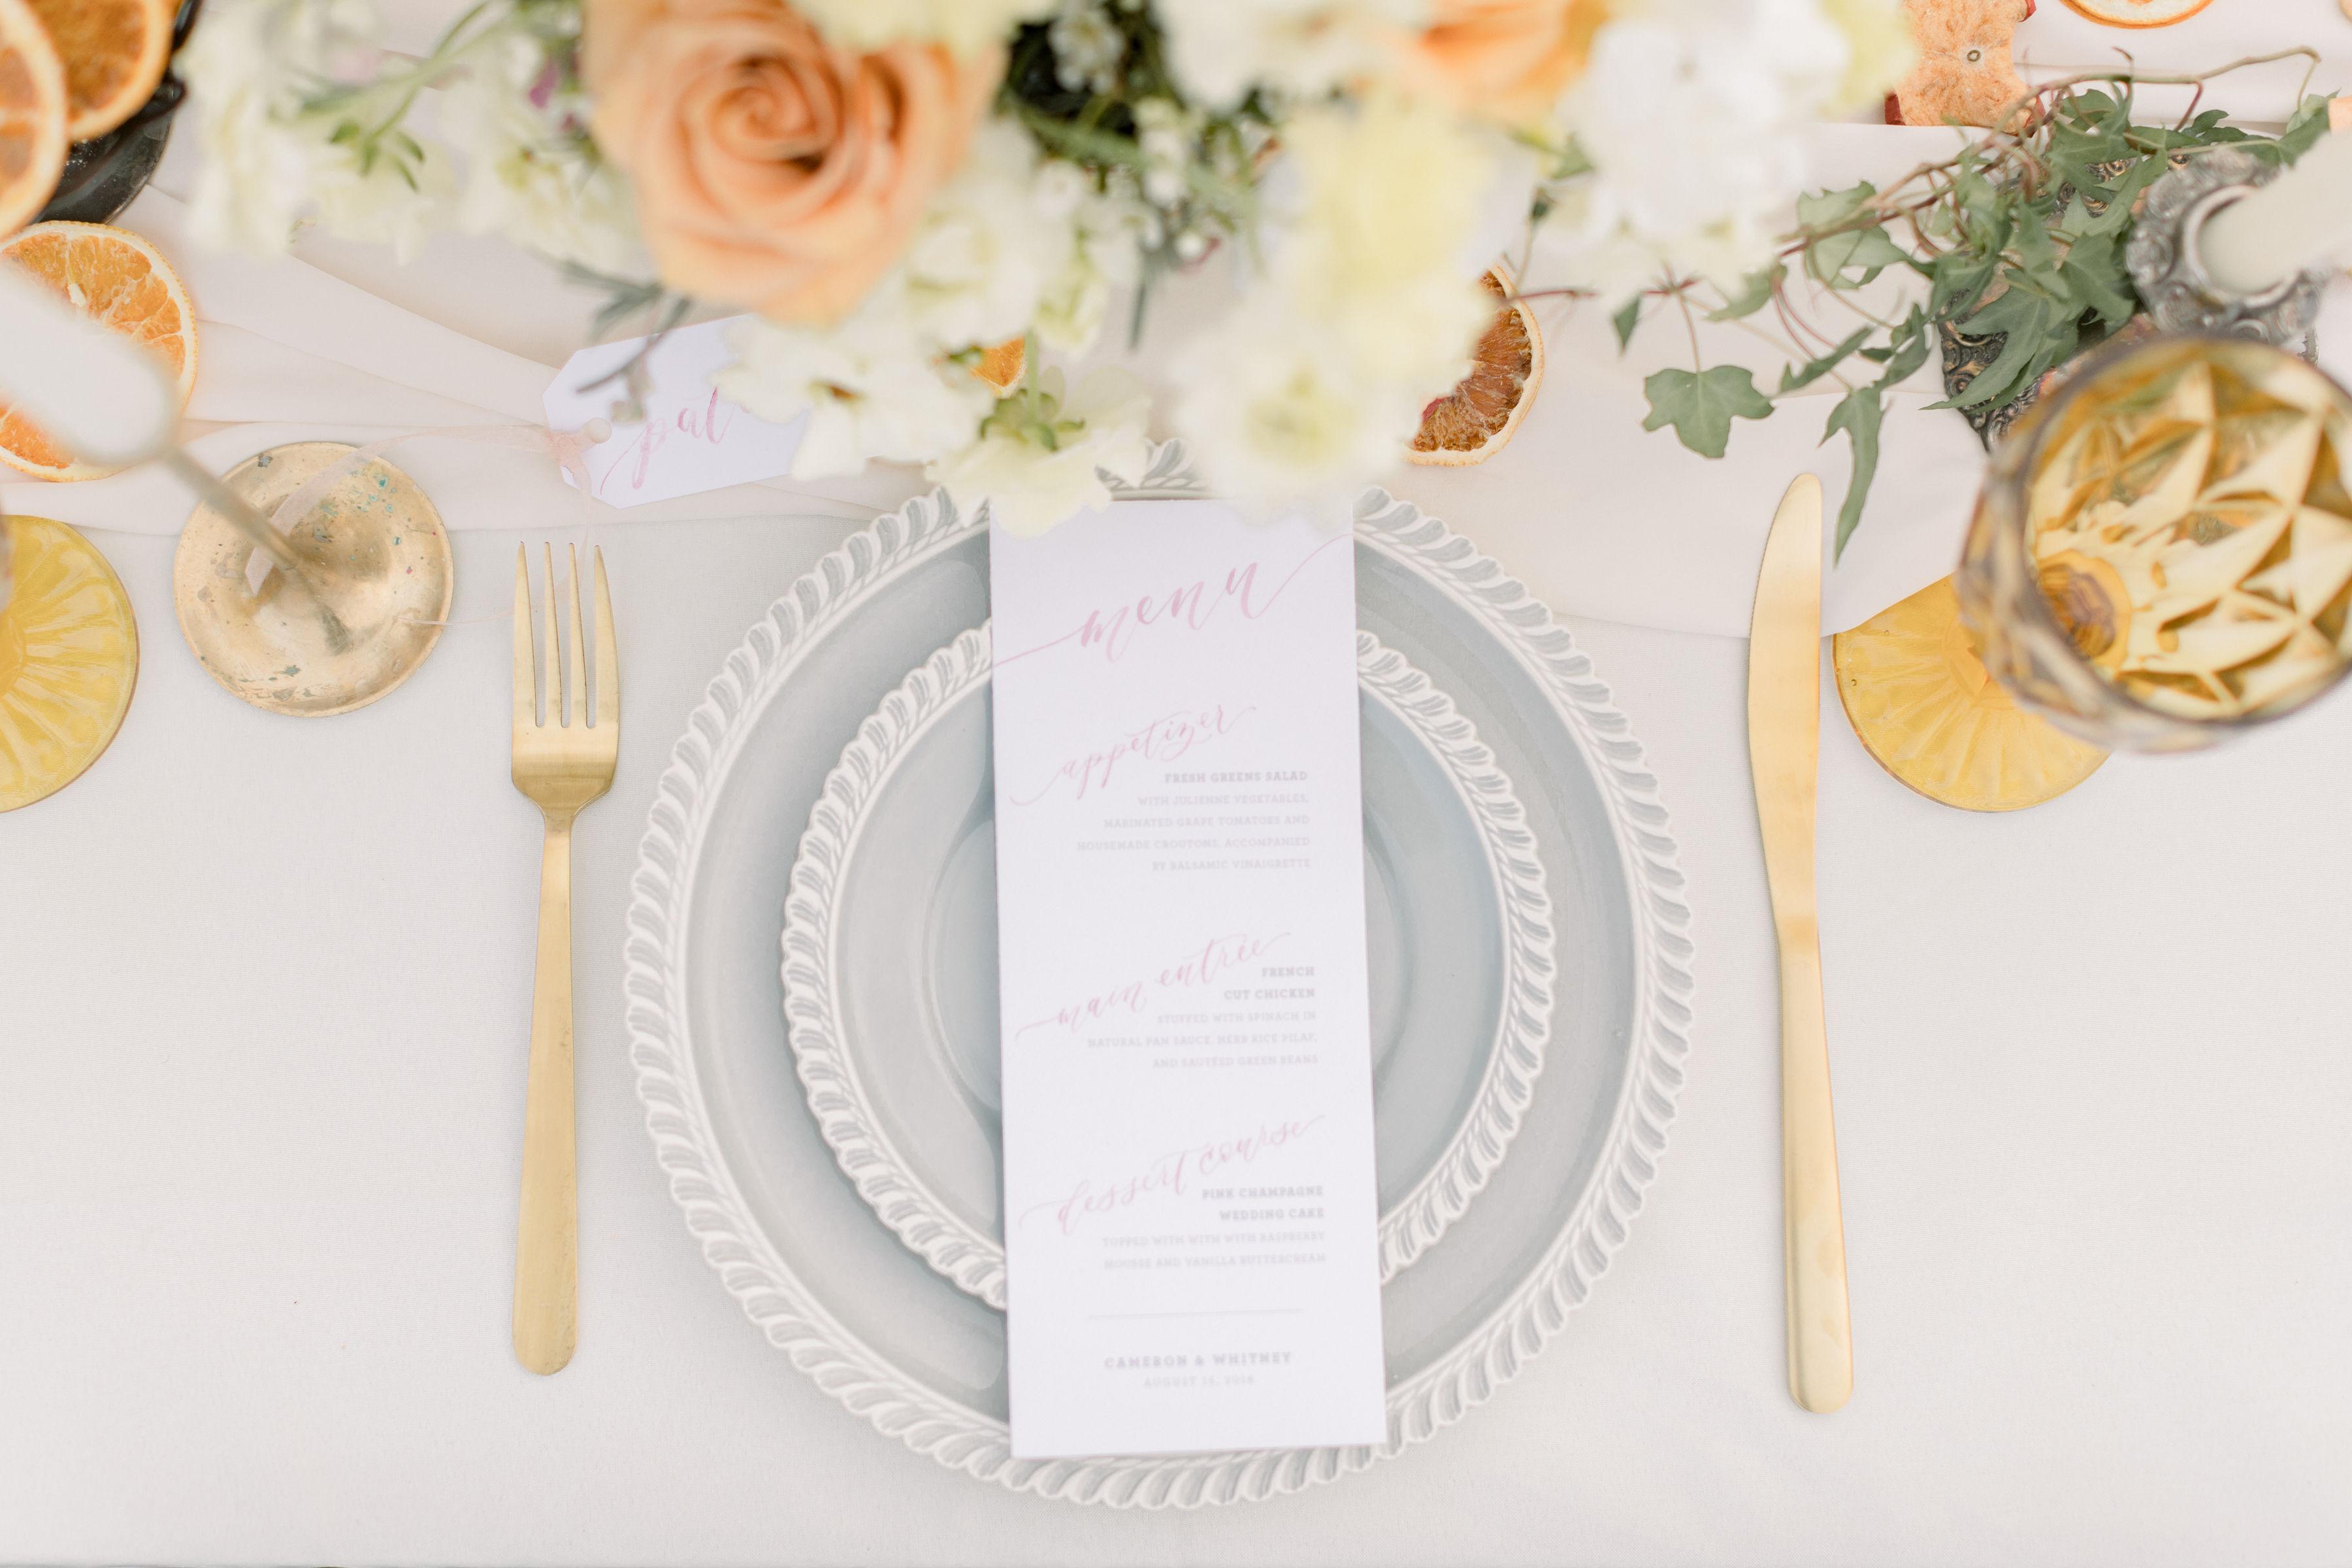 StephanieWeberPhotography-Pink Wedding Reception Tablescape – Sam Allen Creates Watercolor Menu